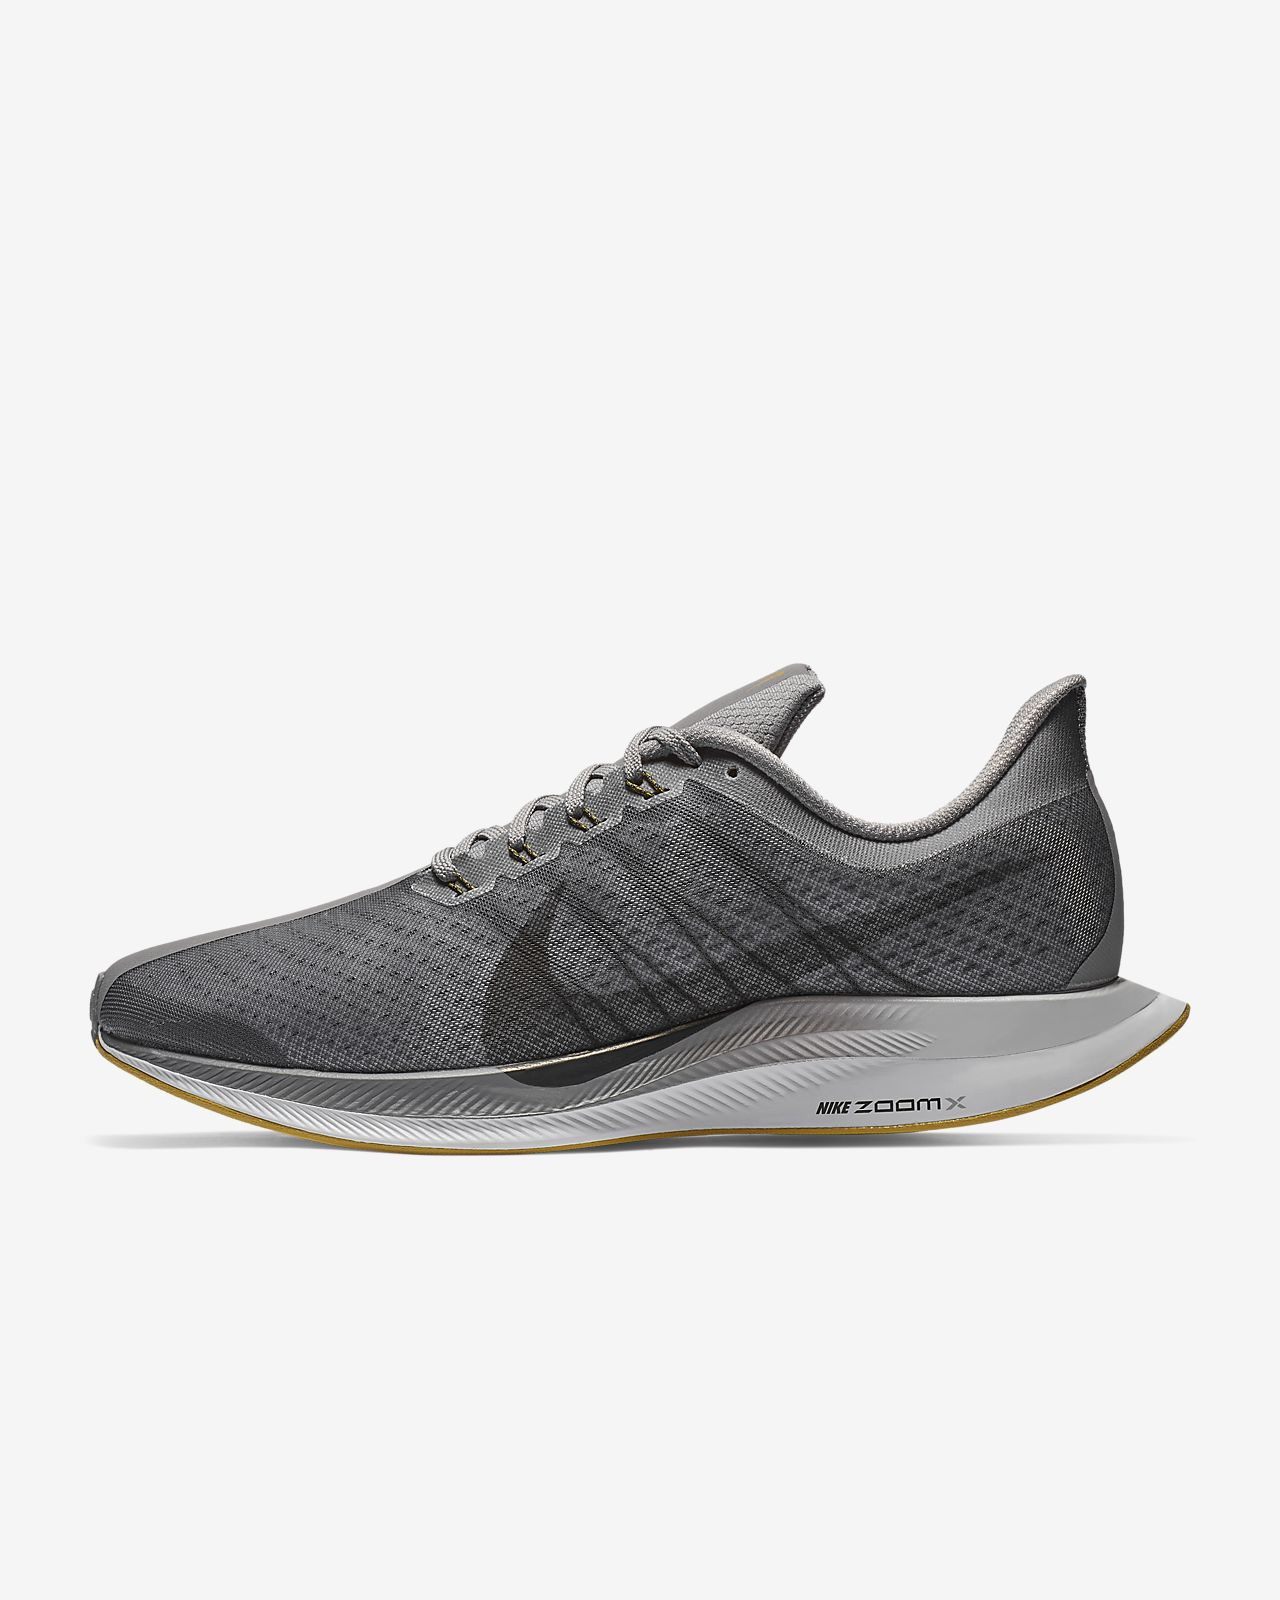 Nike Zoom Pegasus Turbo Herren-Laufschuh